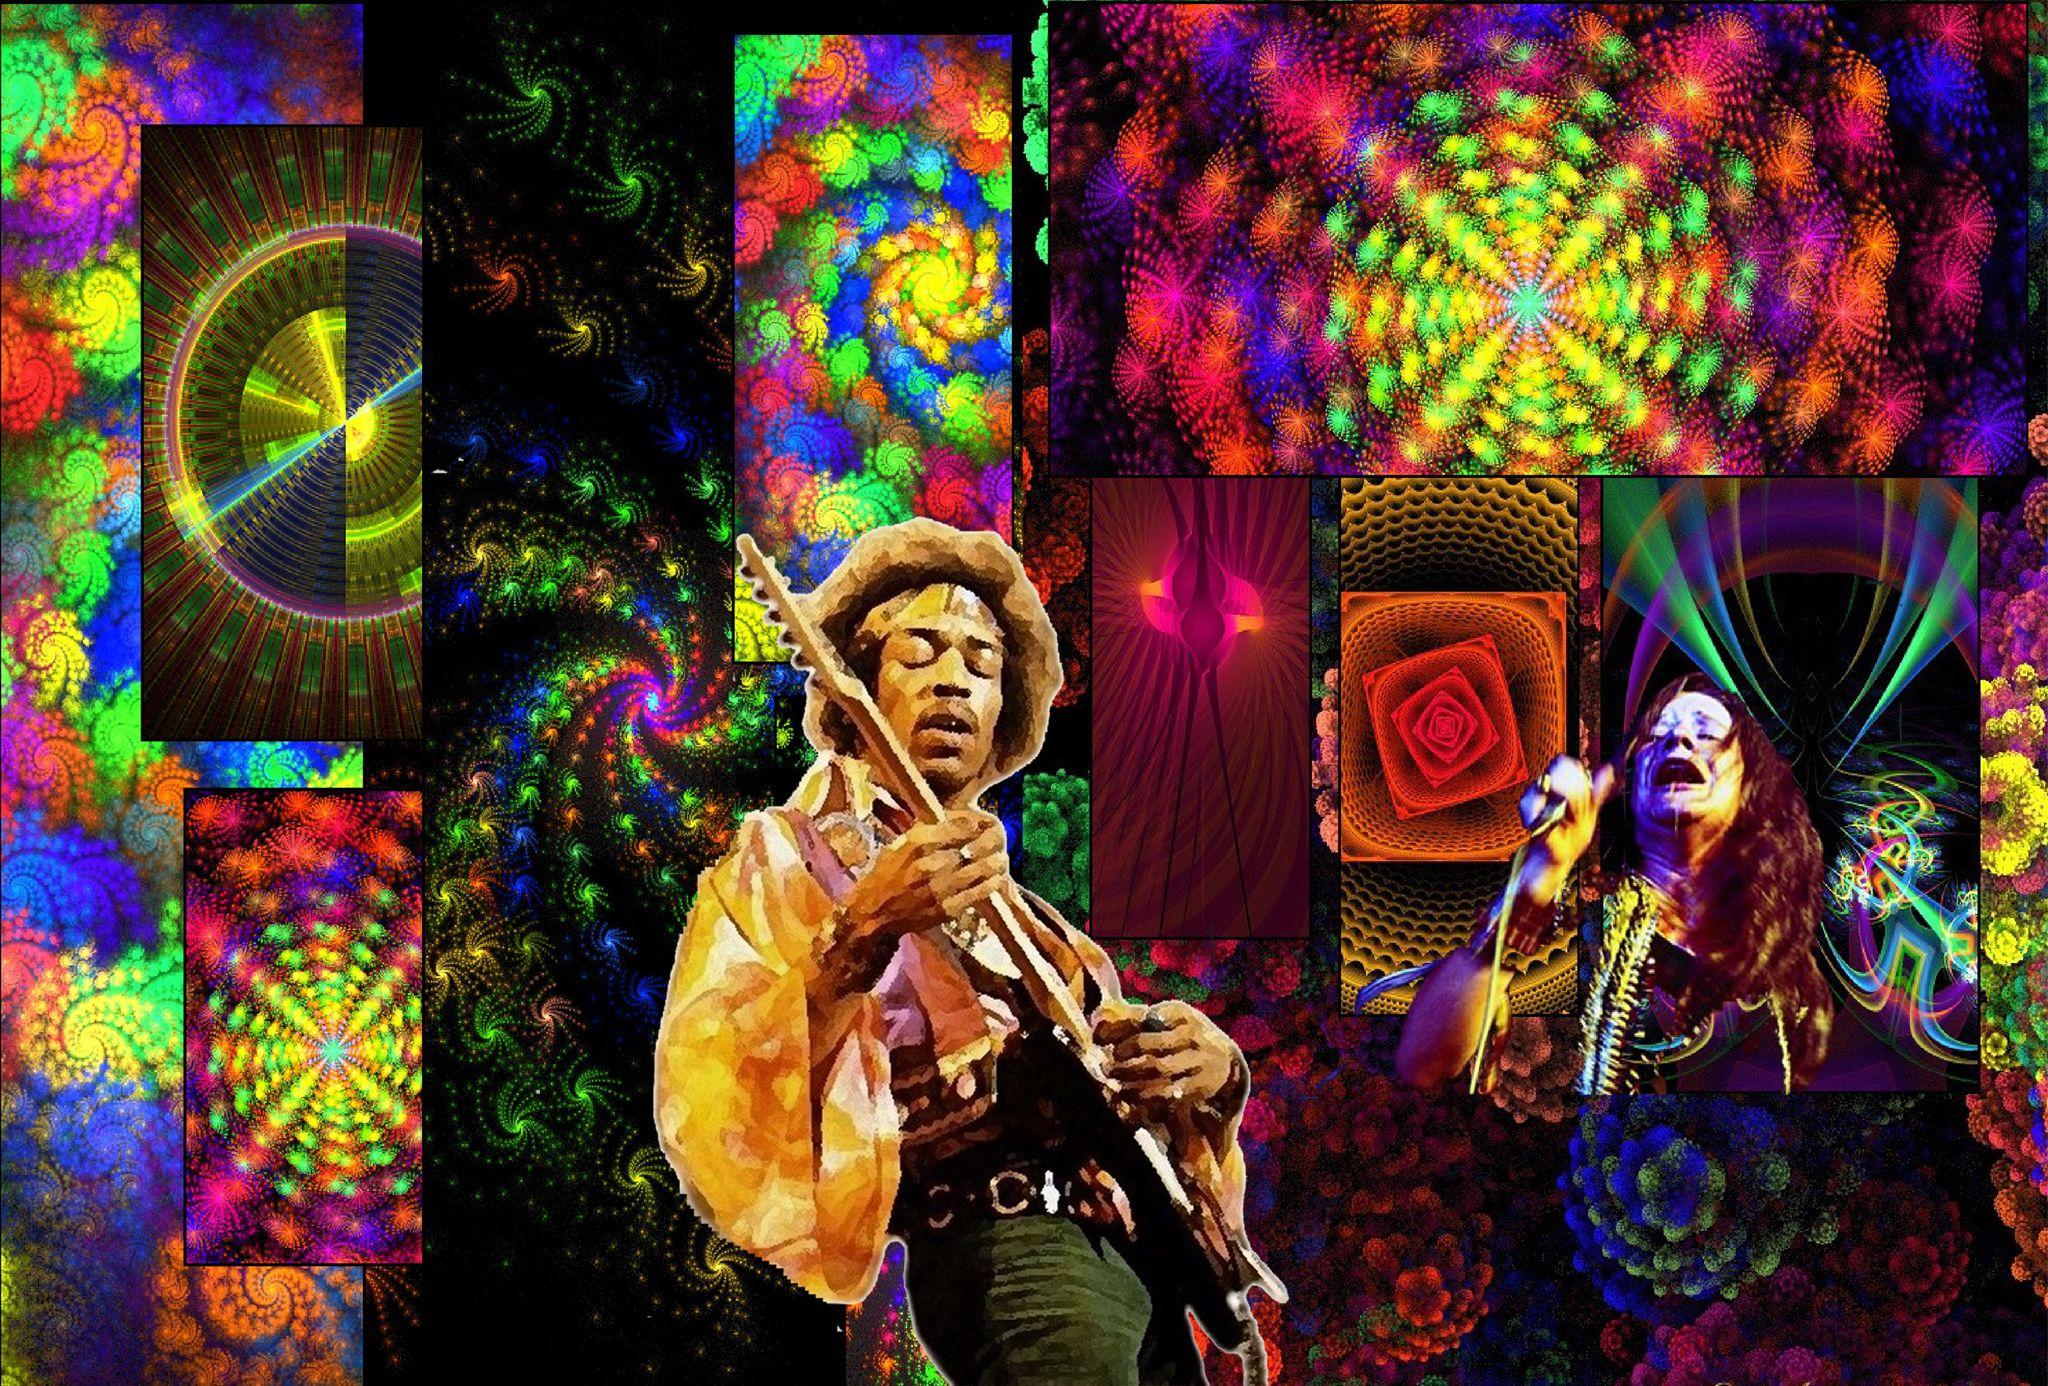 3d Hd Vaporwave Wallpaper The Definitive Woodstock Giants Remembrance Hd Wallpaper